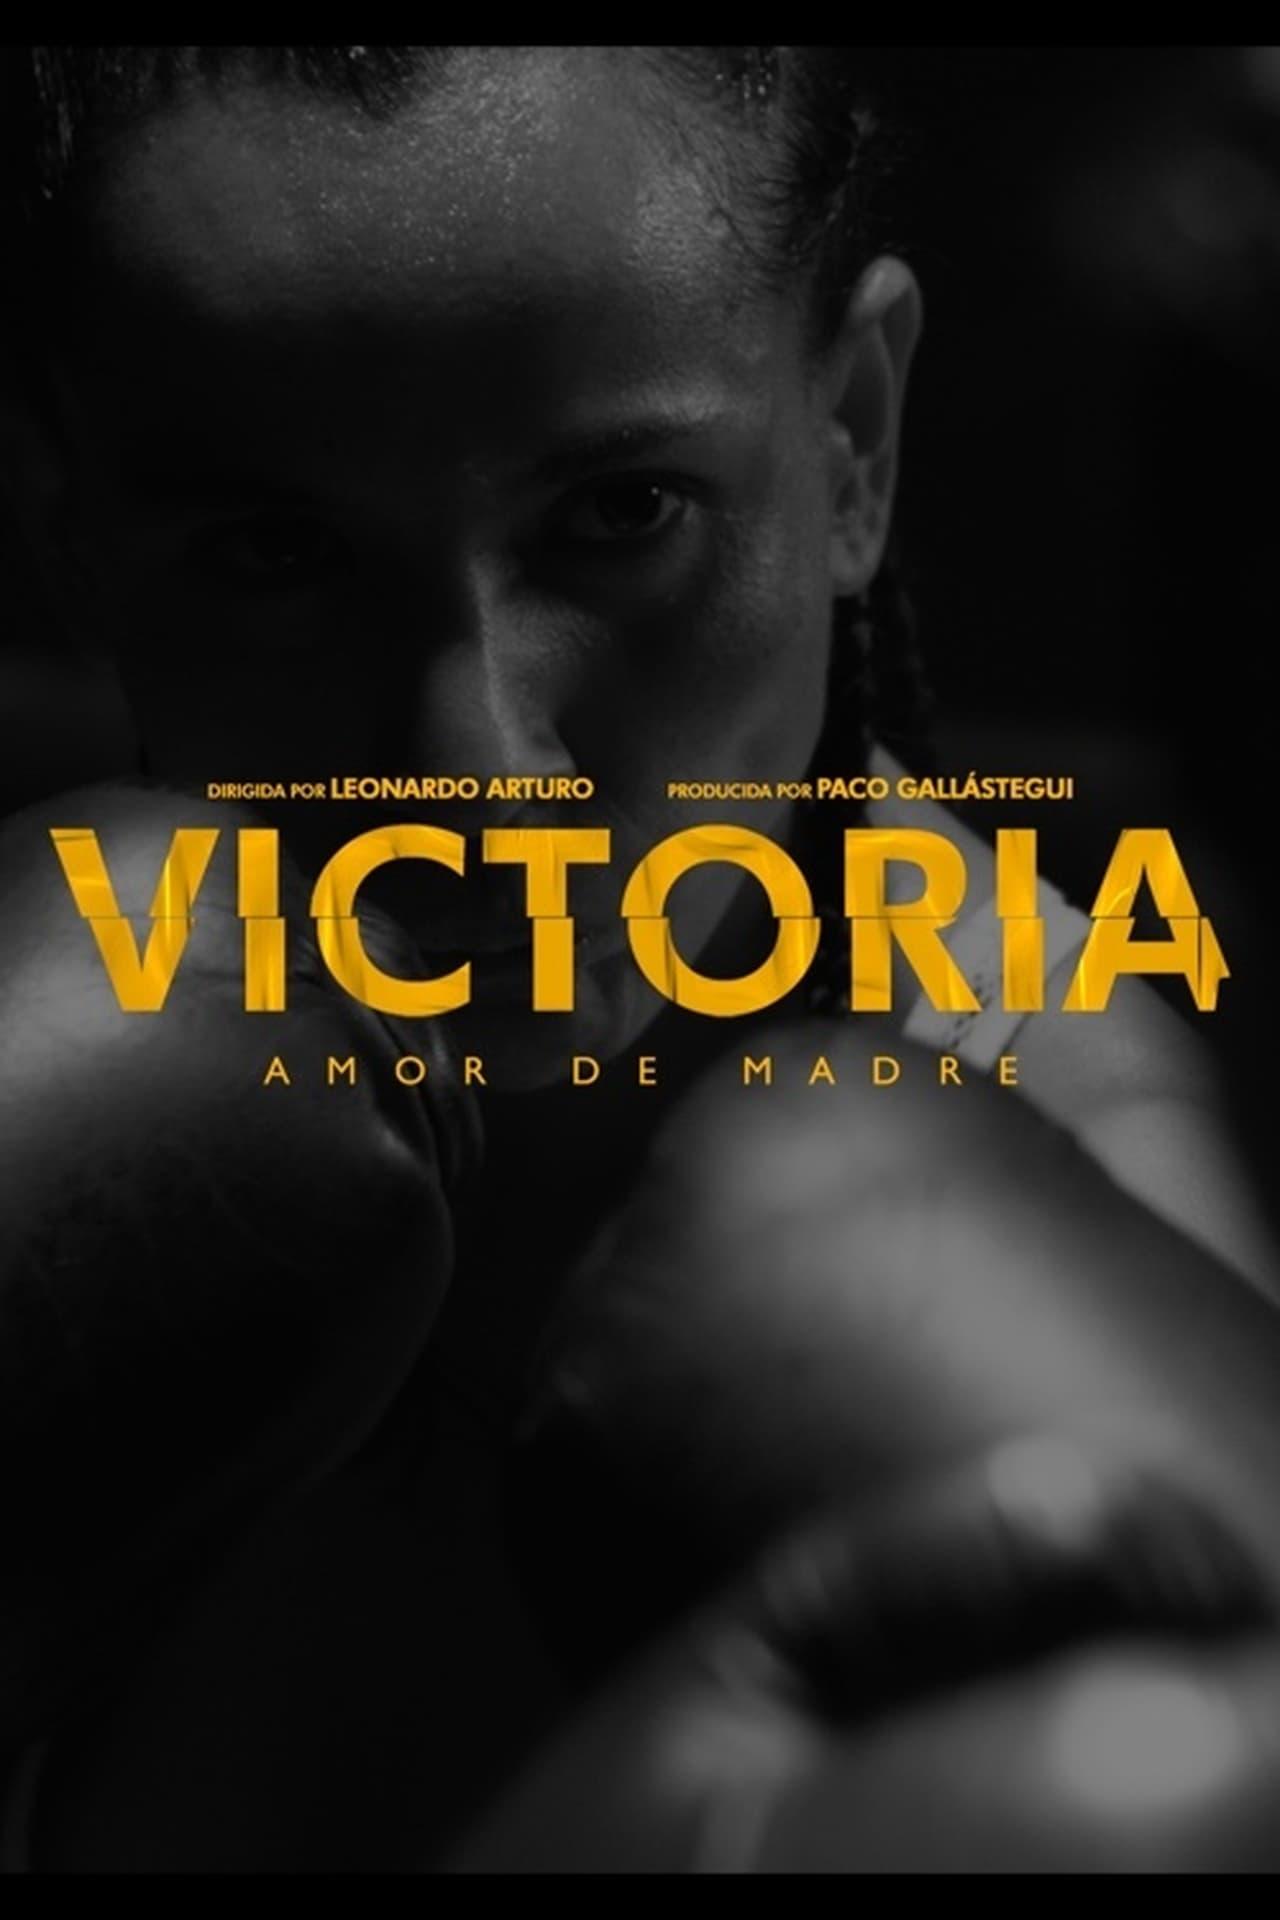 VICTORIA, Amor de Madre